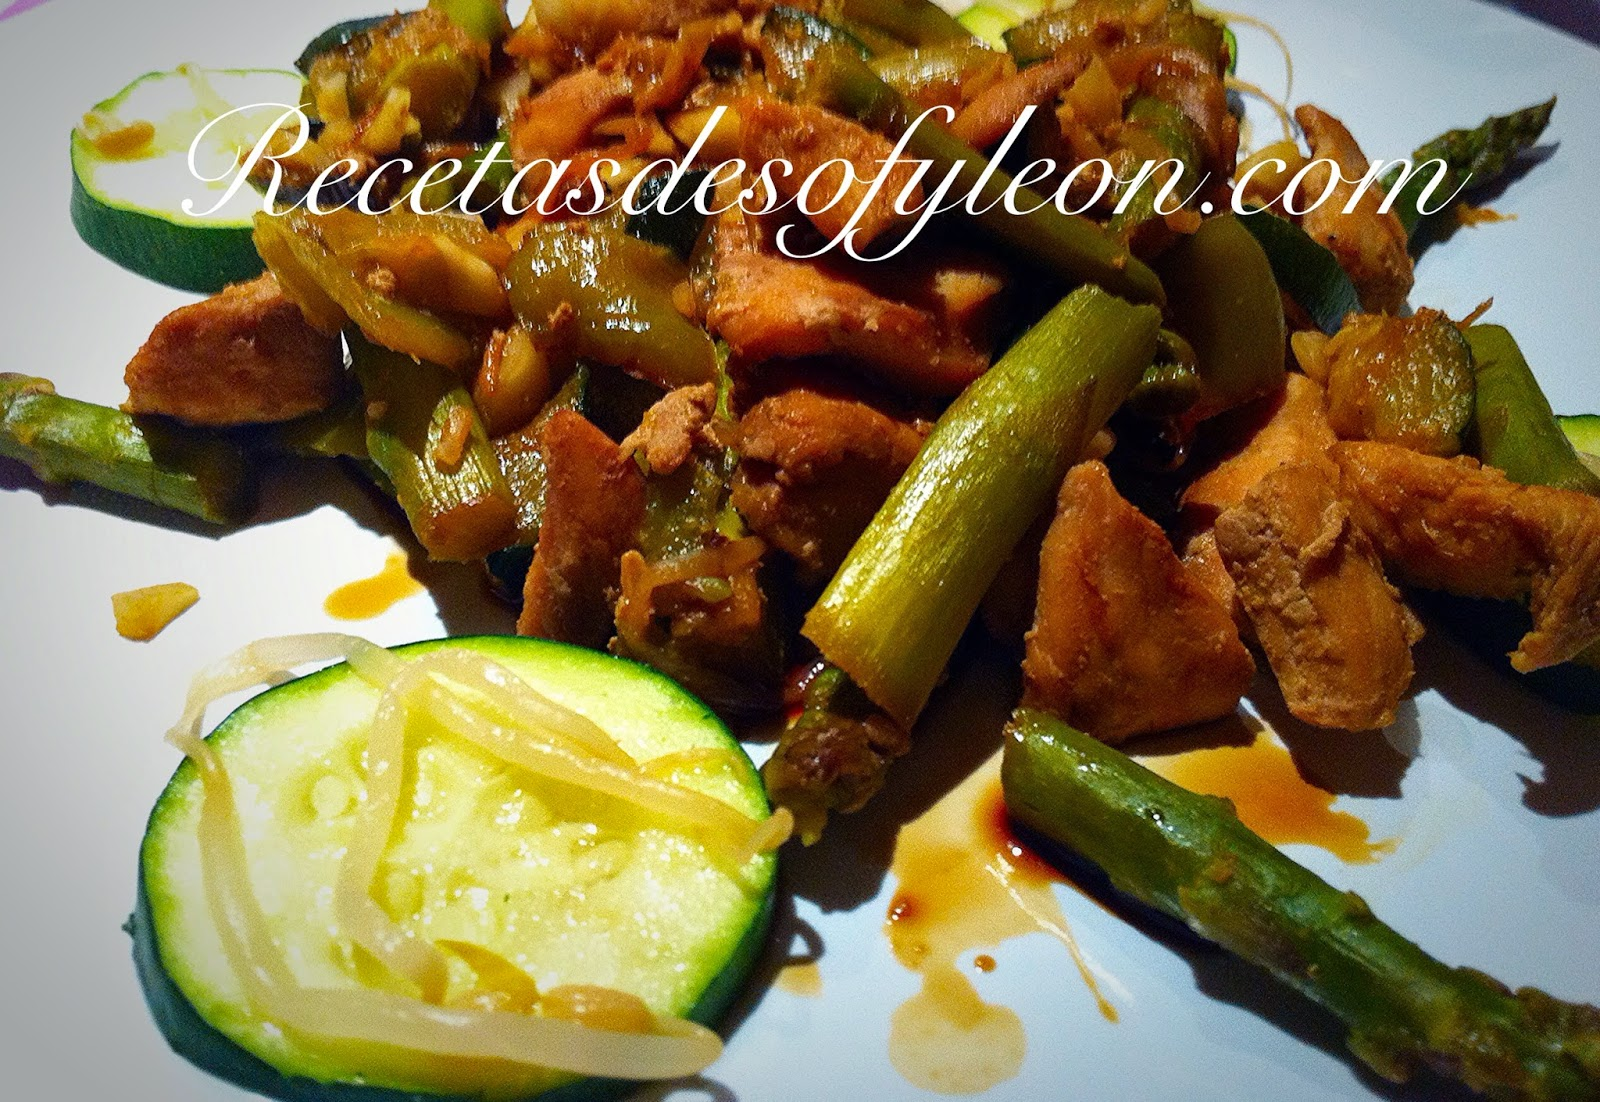 Receta de pollo macerado en salsa de soja con verduras.